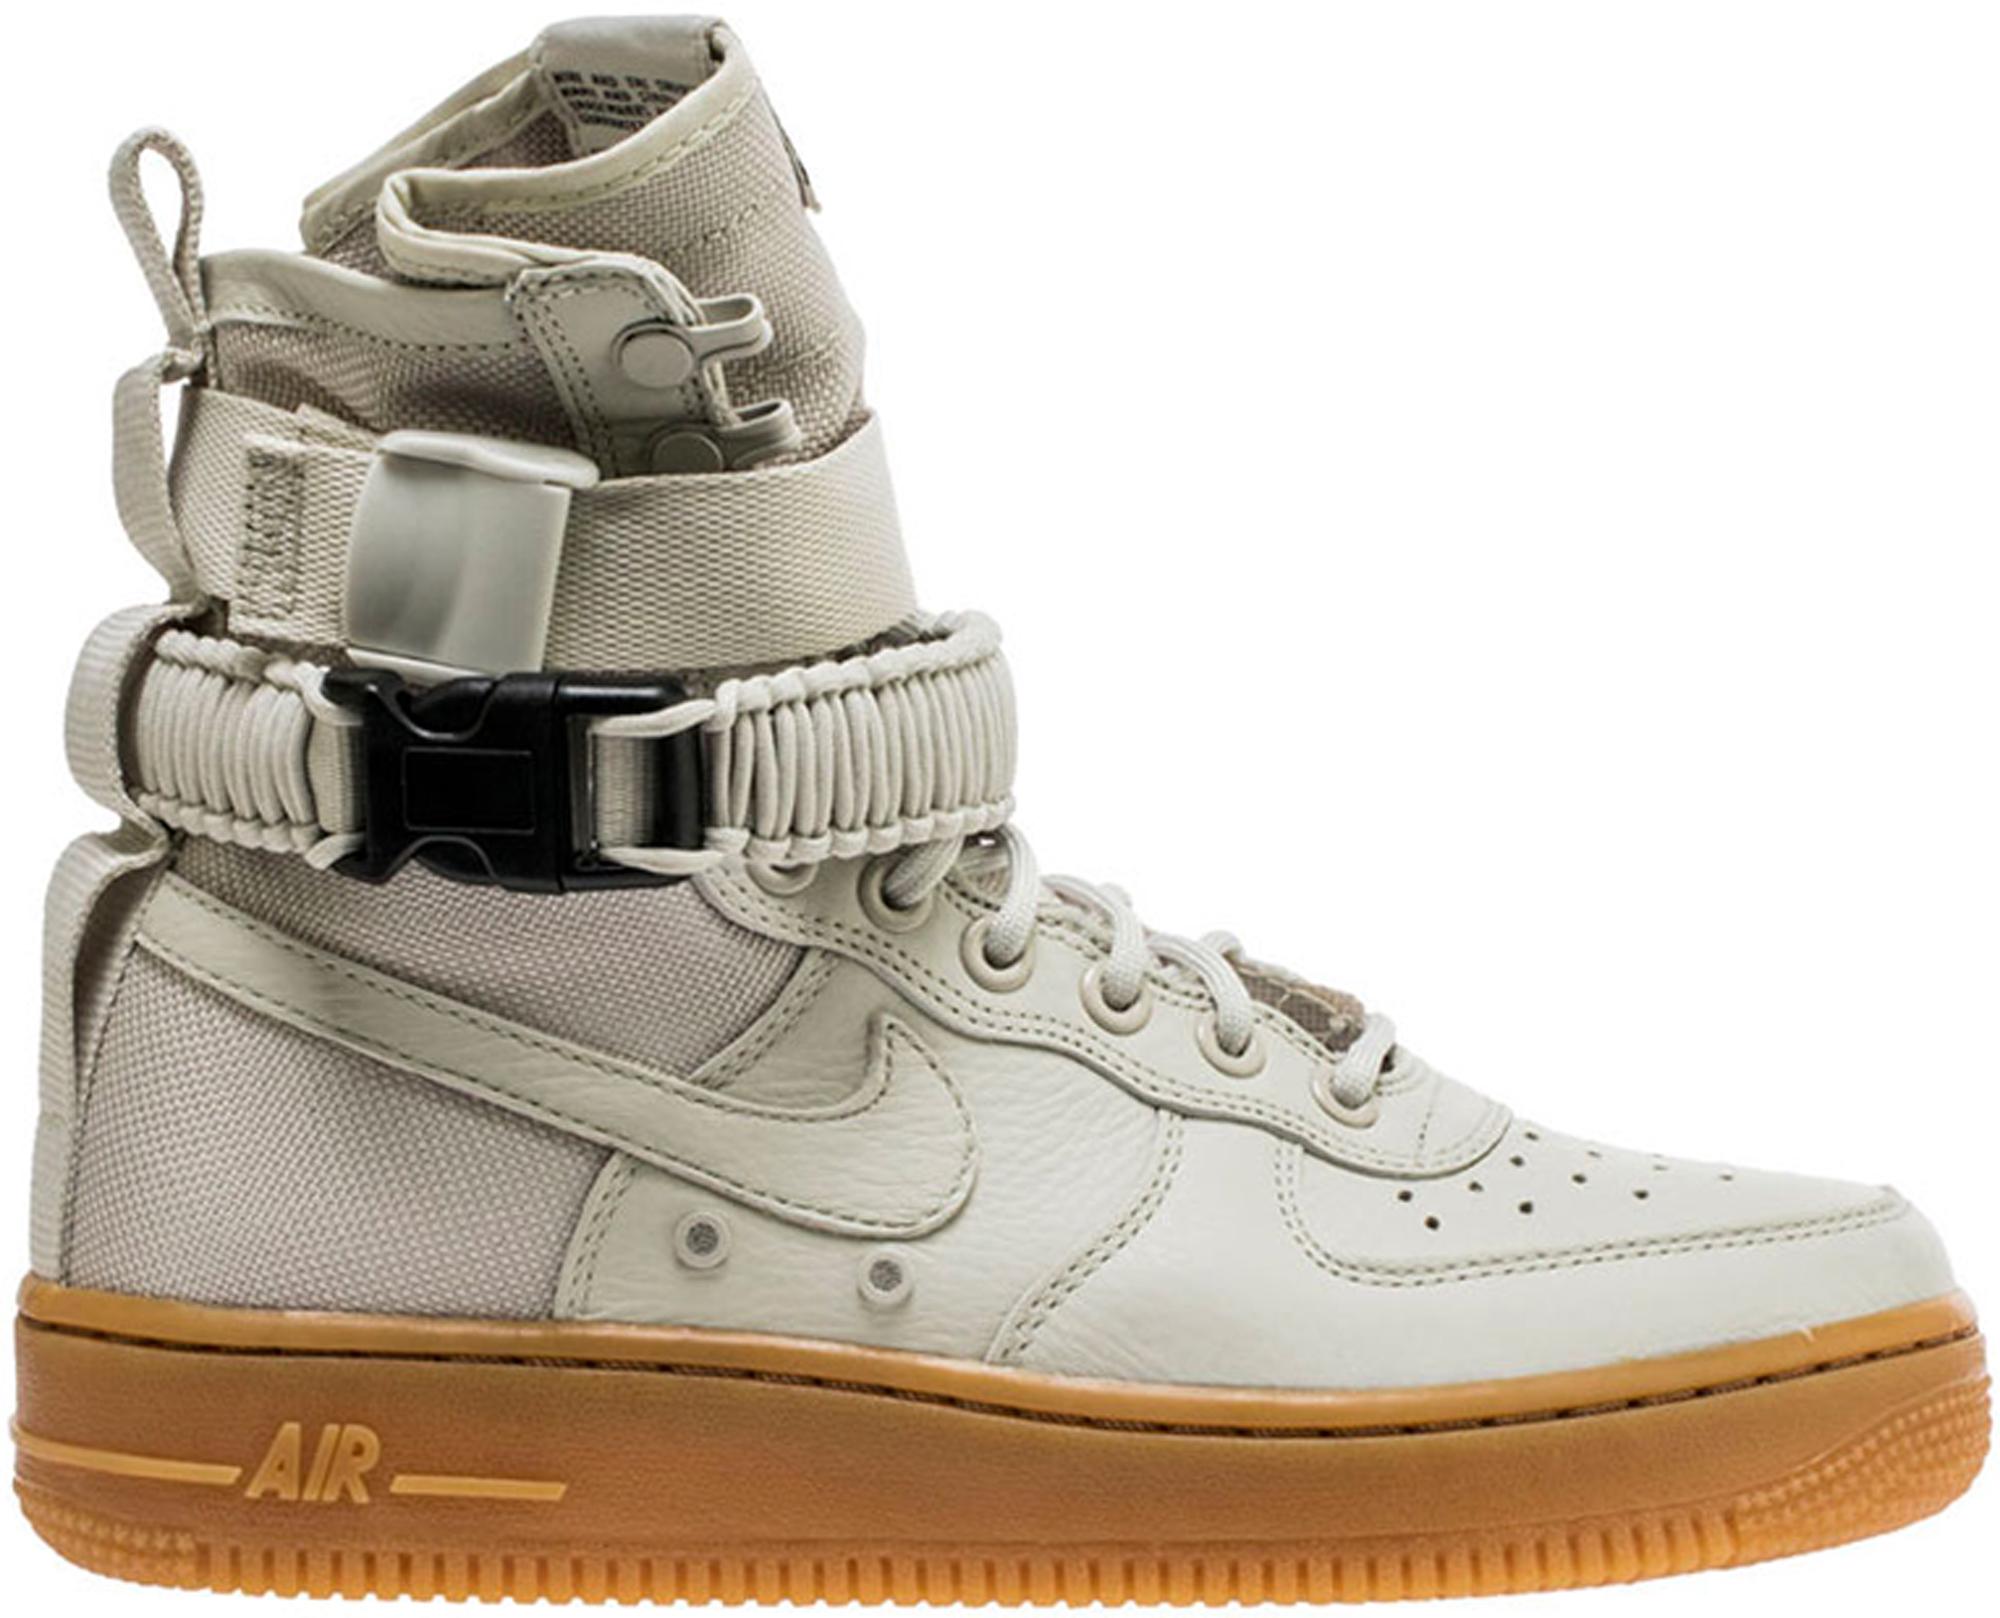 Nike SF Air Force 1 High Light Bone (W)